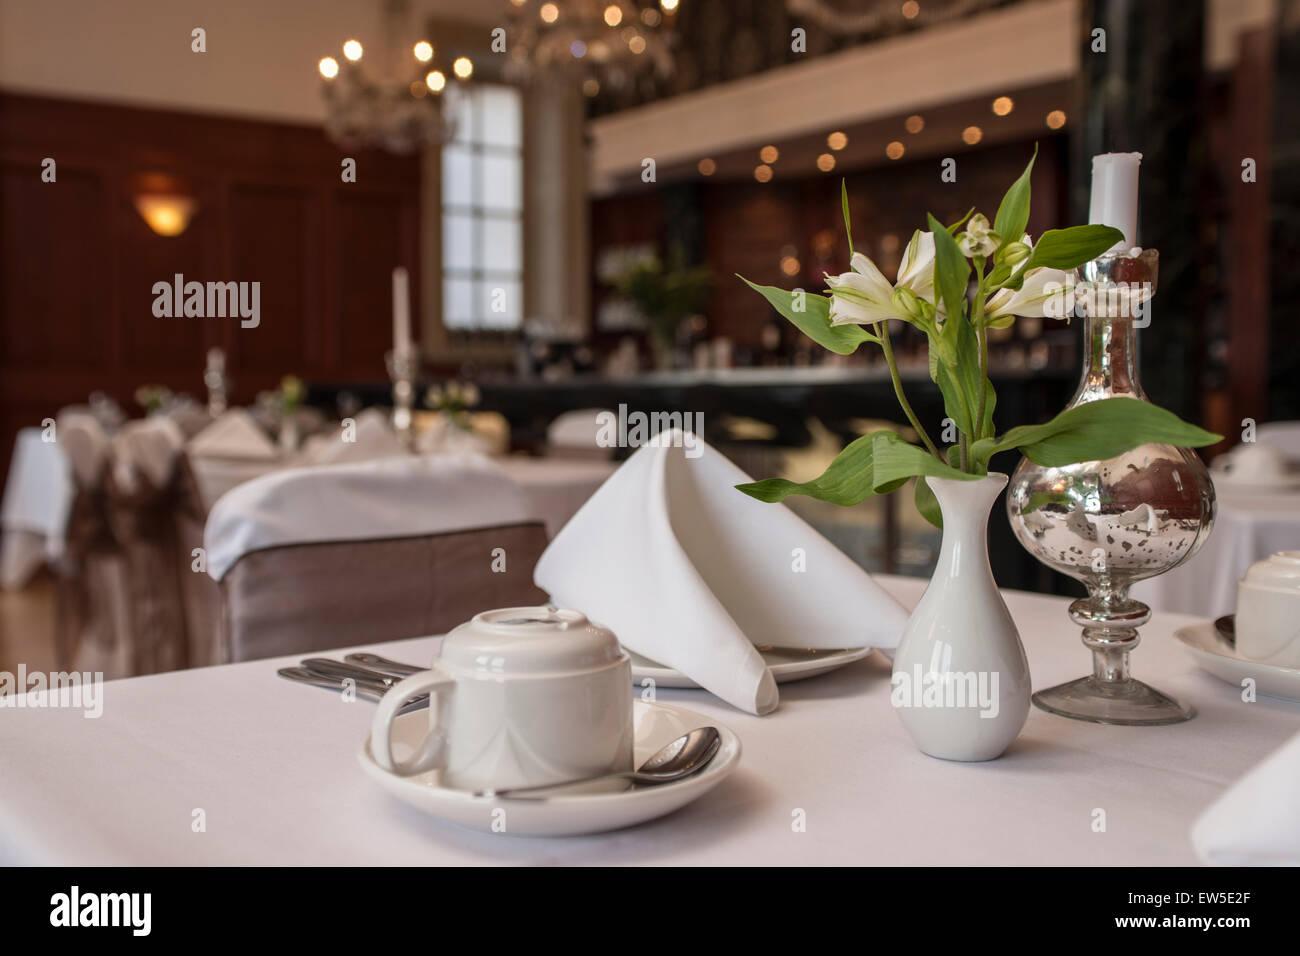 table setting in an upmarket hotel restaurant - Stock Image